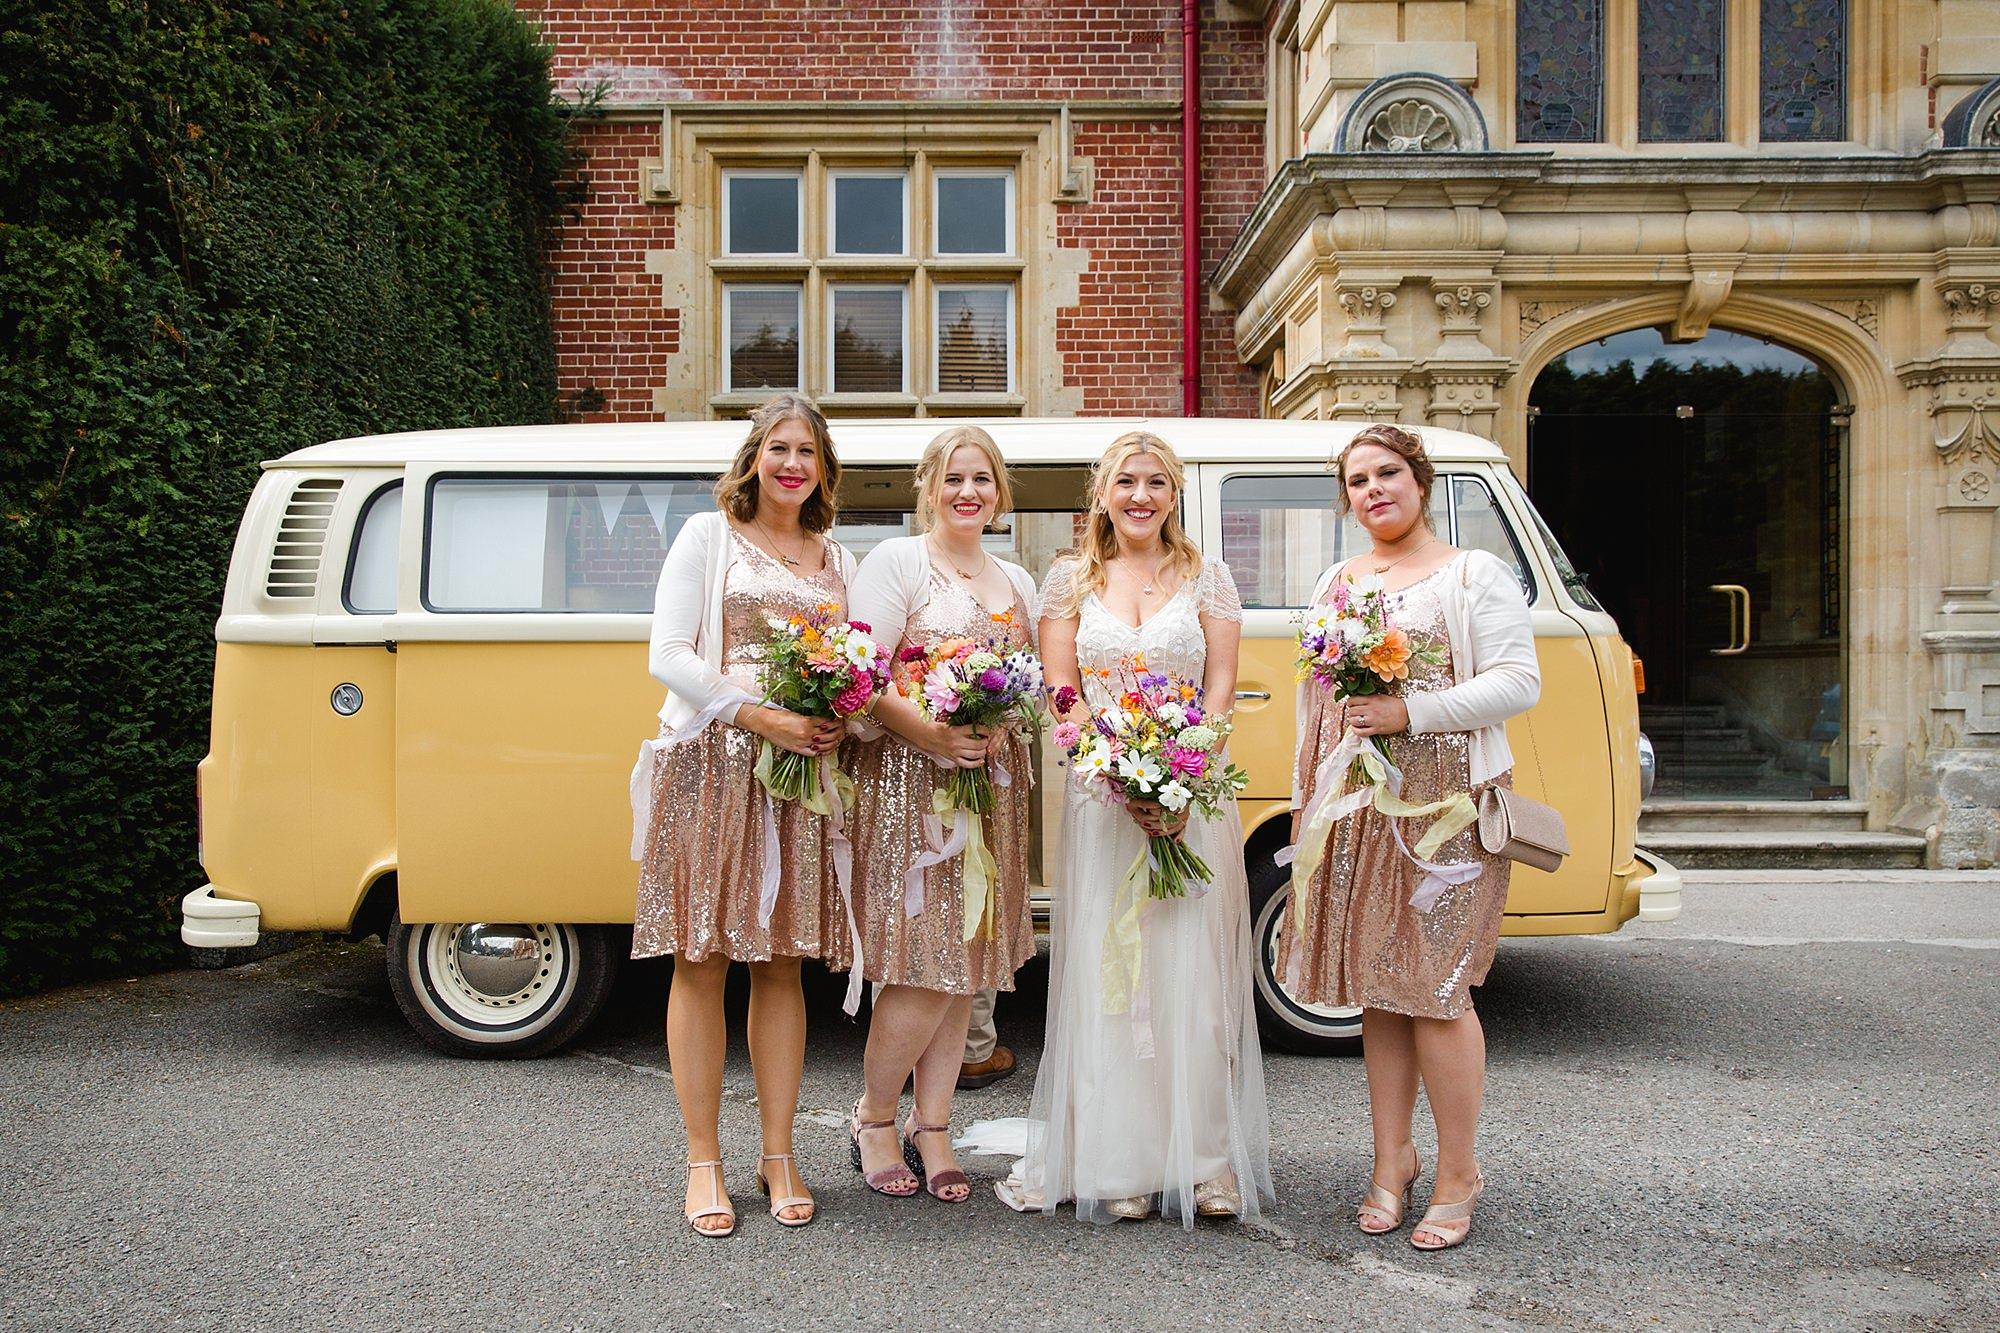 Woodland Weddings Tring bride and bridesmaids with camper van